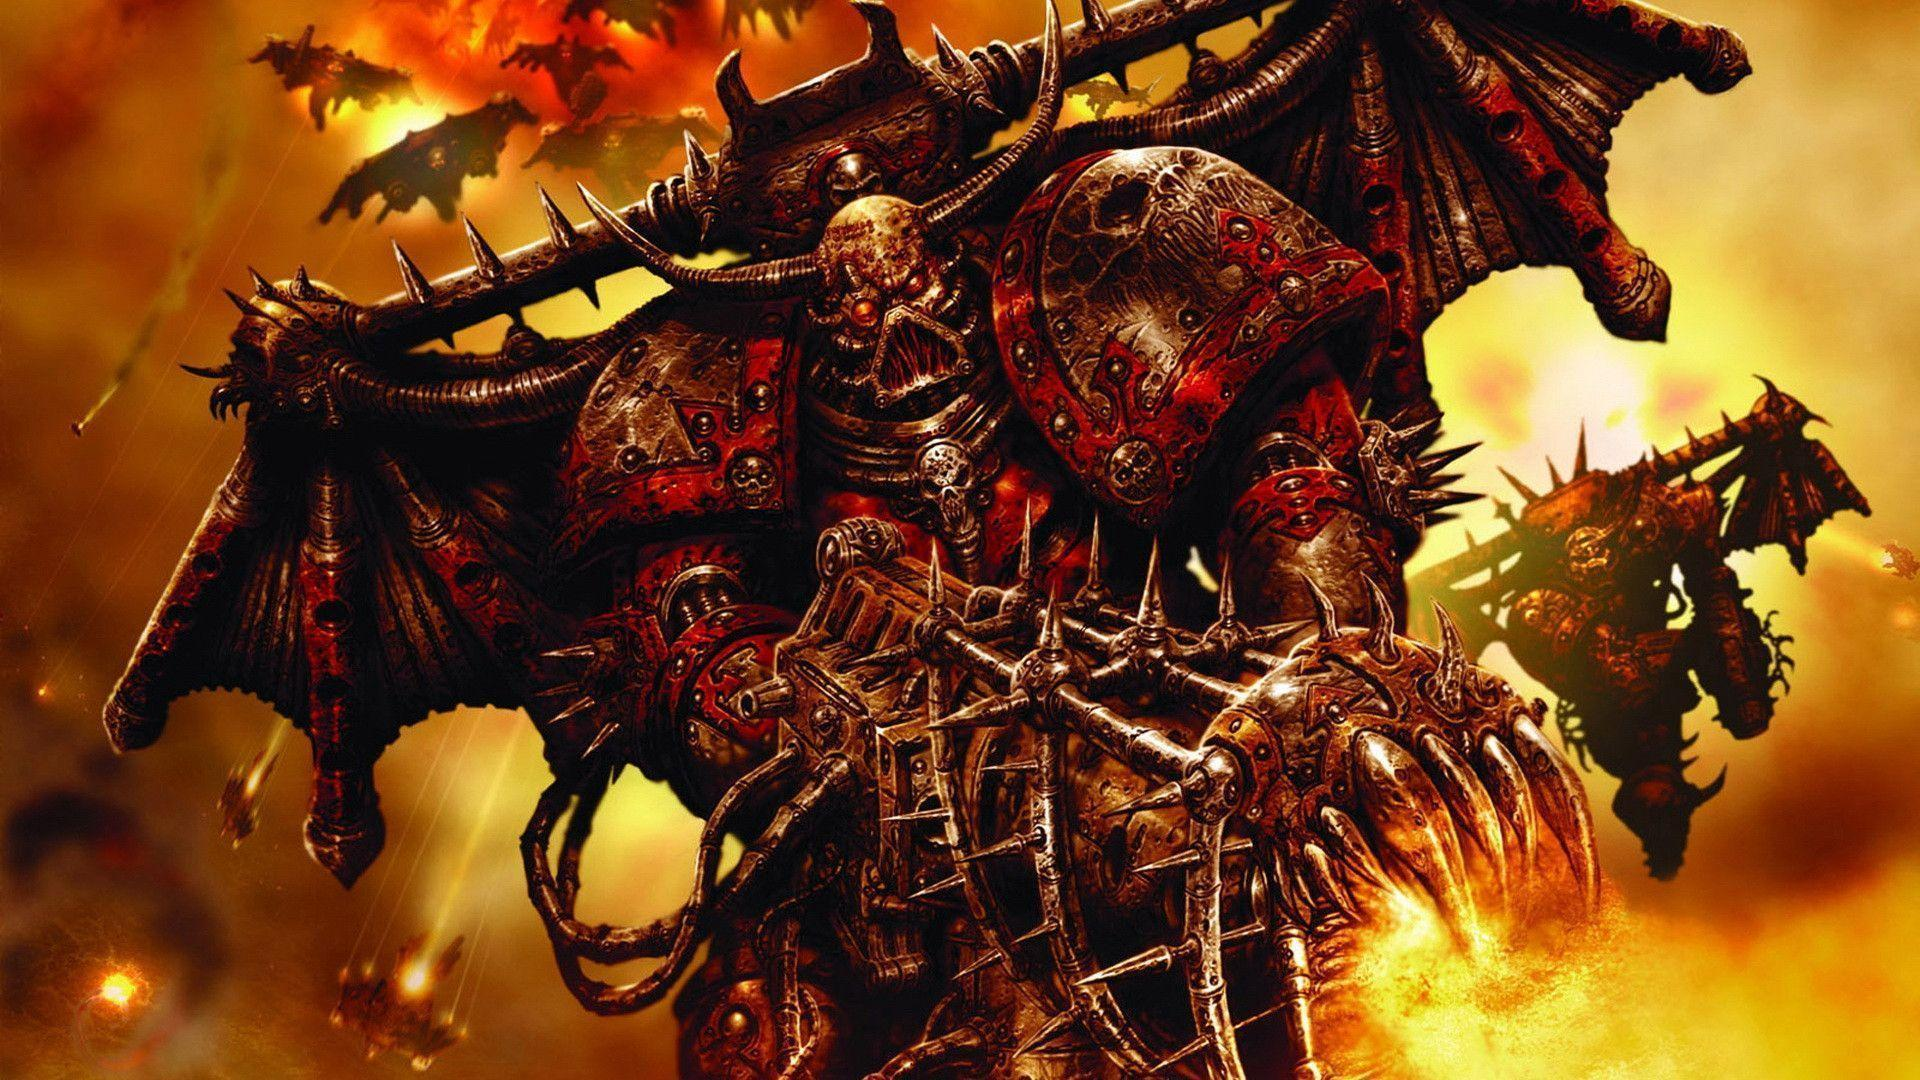 wallpaper warhammer 40k video - photo #26